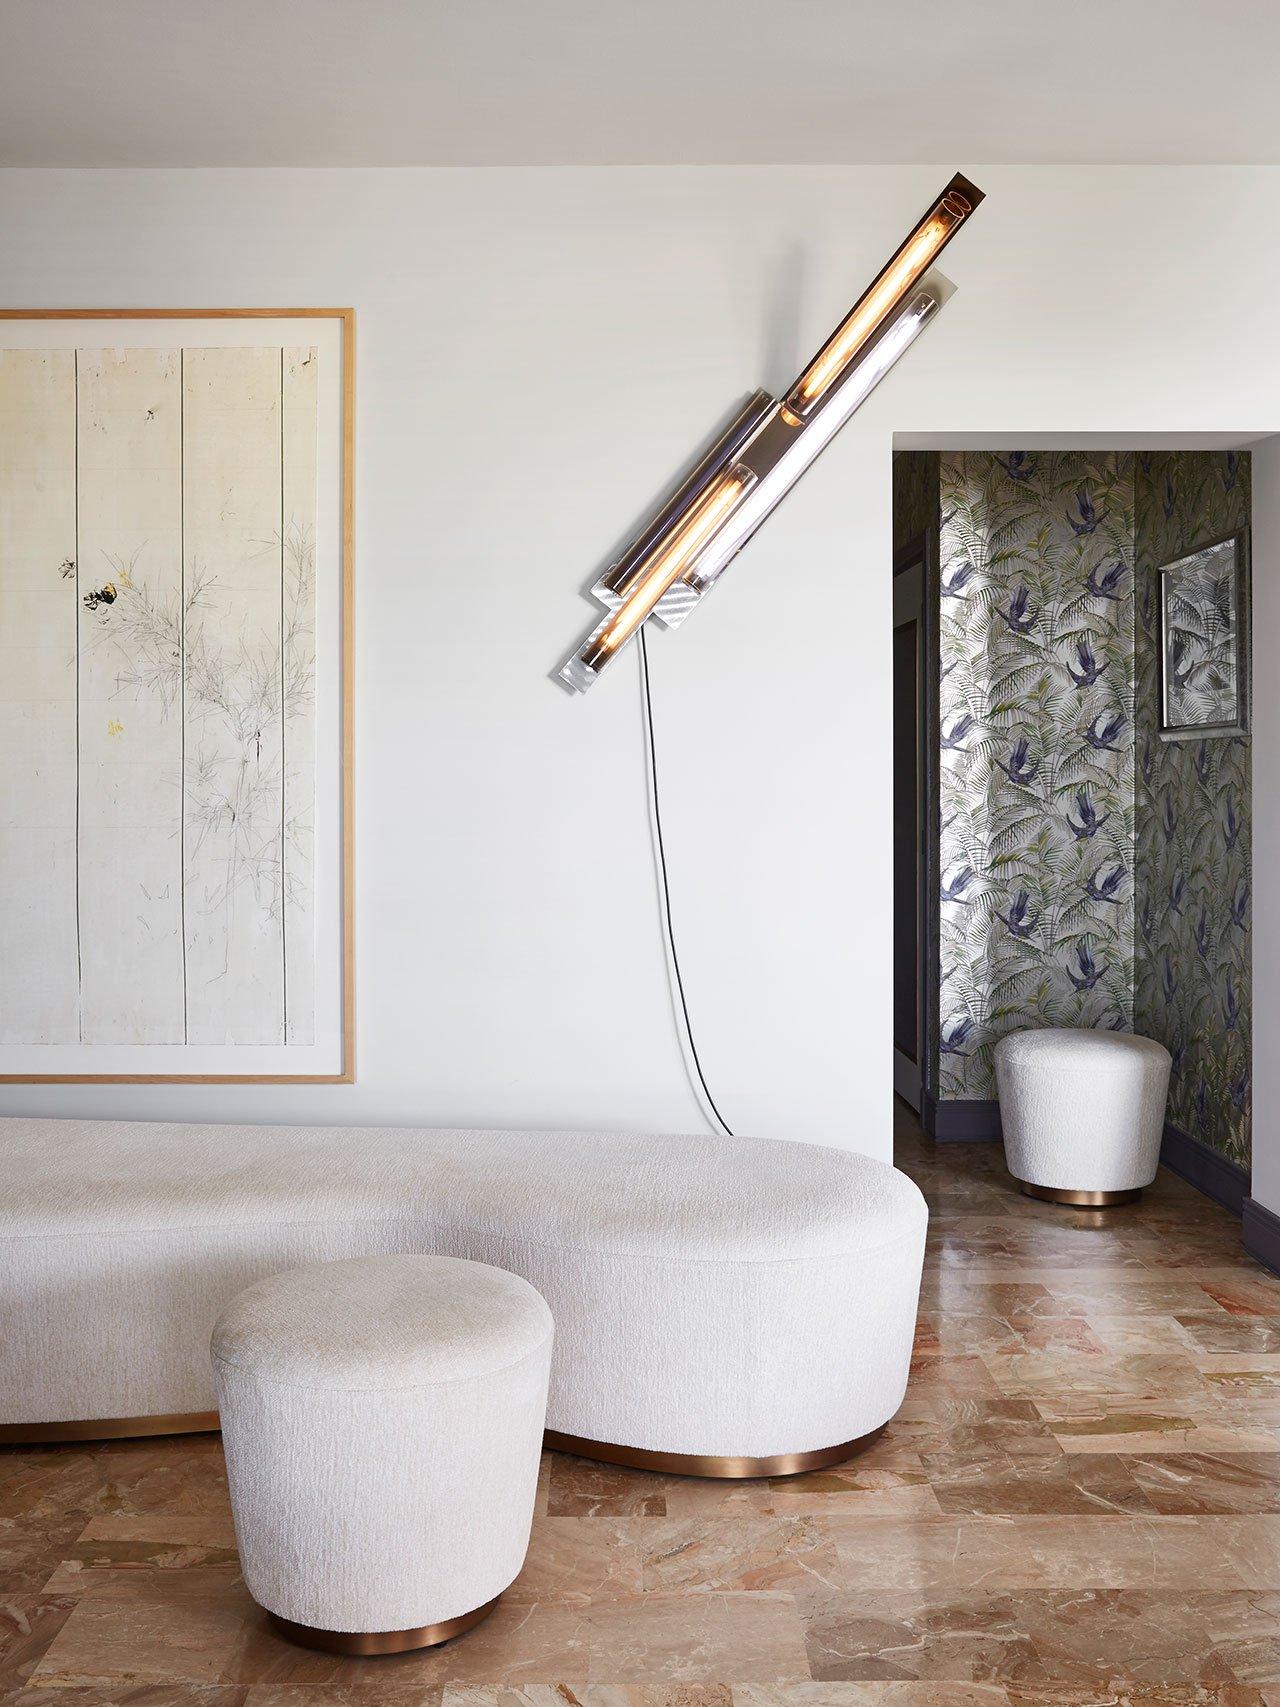 Sputnik Chandelier Lights Up Mid-Century Dining Room in Monaco 5